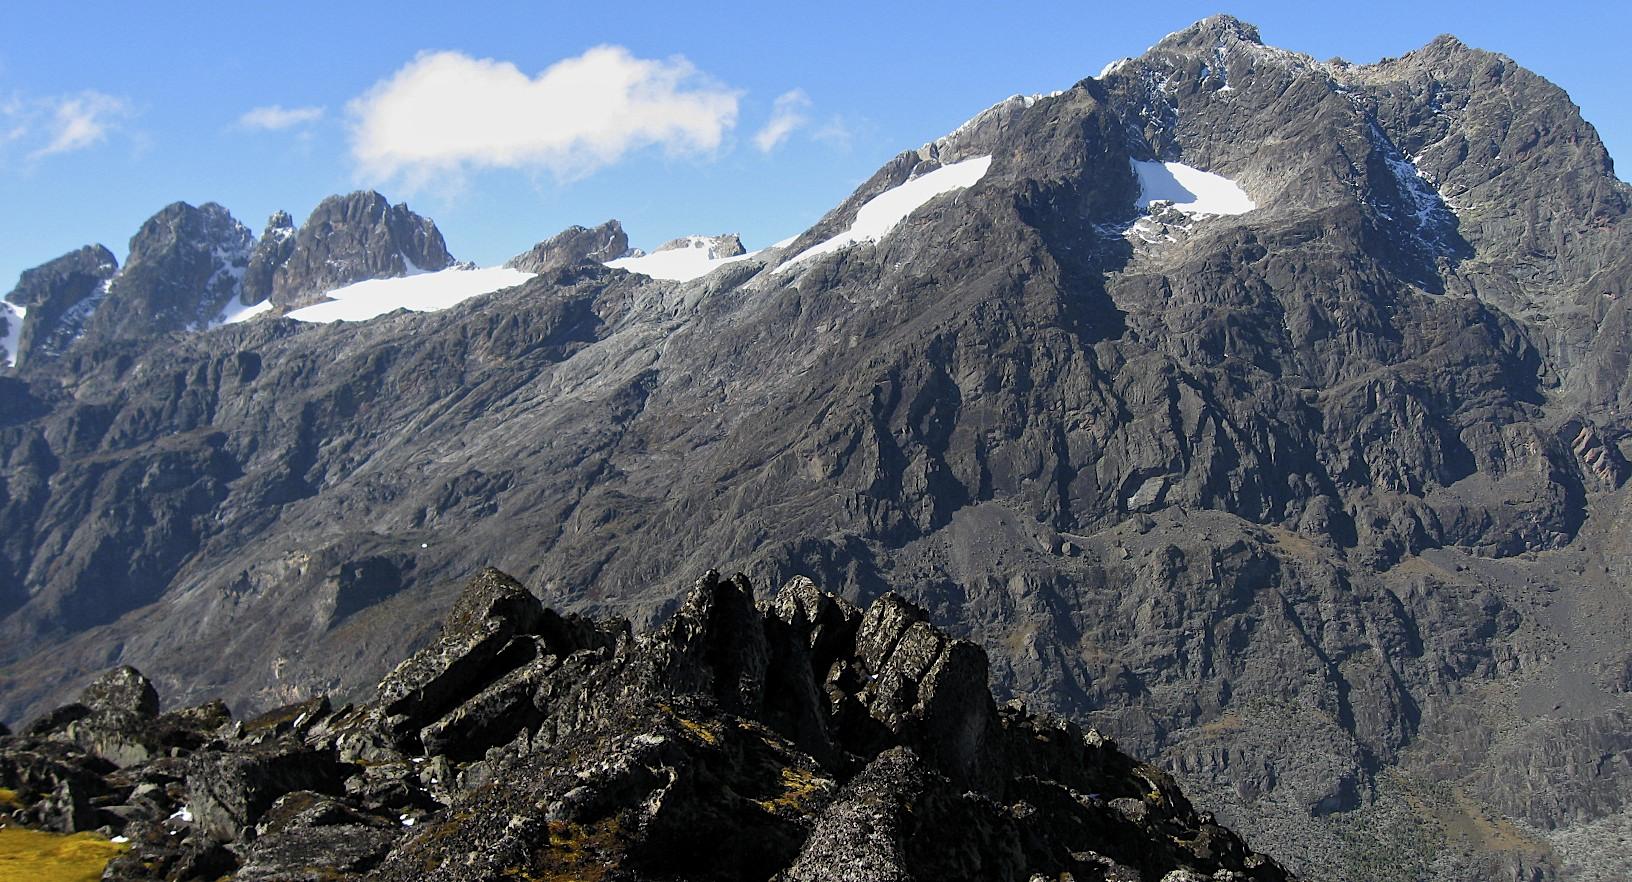 Mt. Margarita 5,109m from Mt. Speke